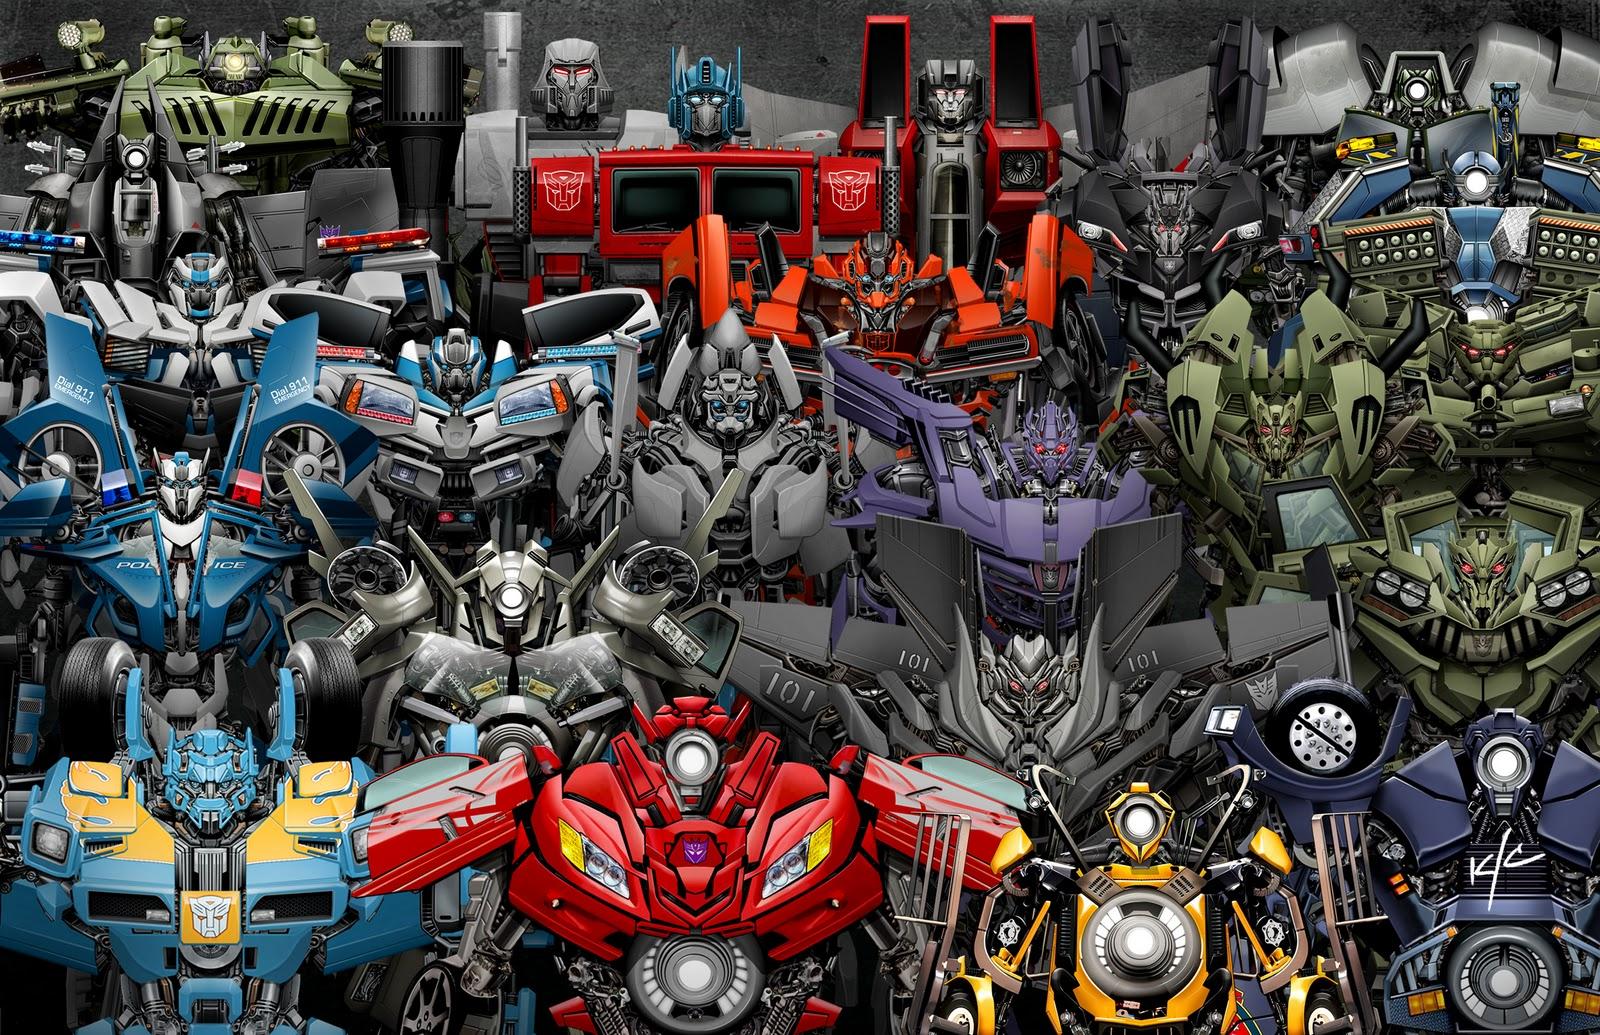 Transformers 6 : Bumblebee Movie - CAST ROBOT 2018 (1080p) VOL 1 ...